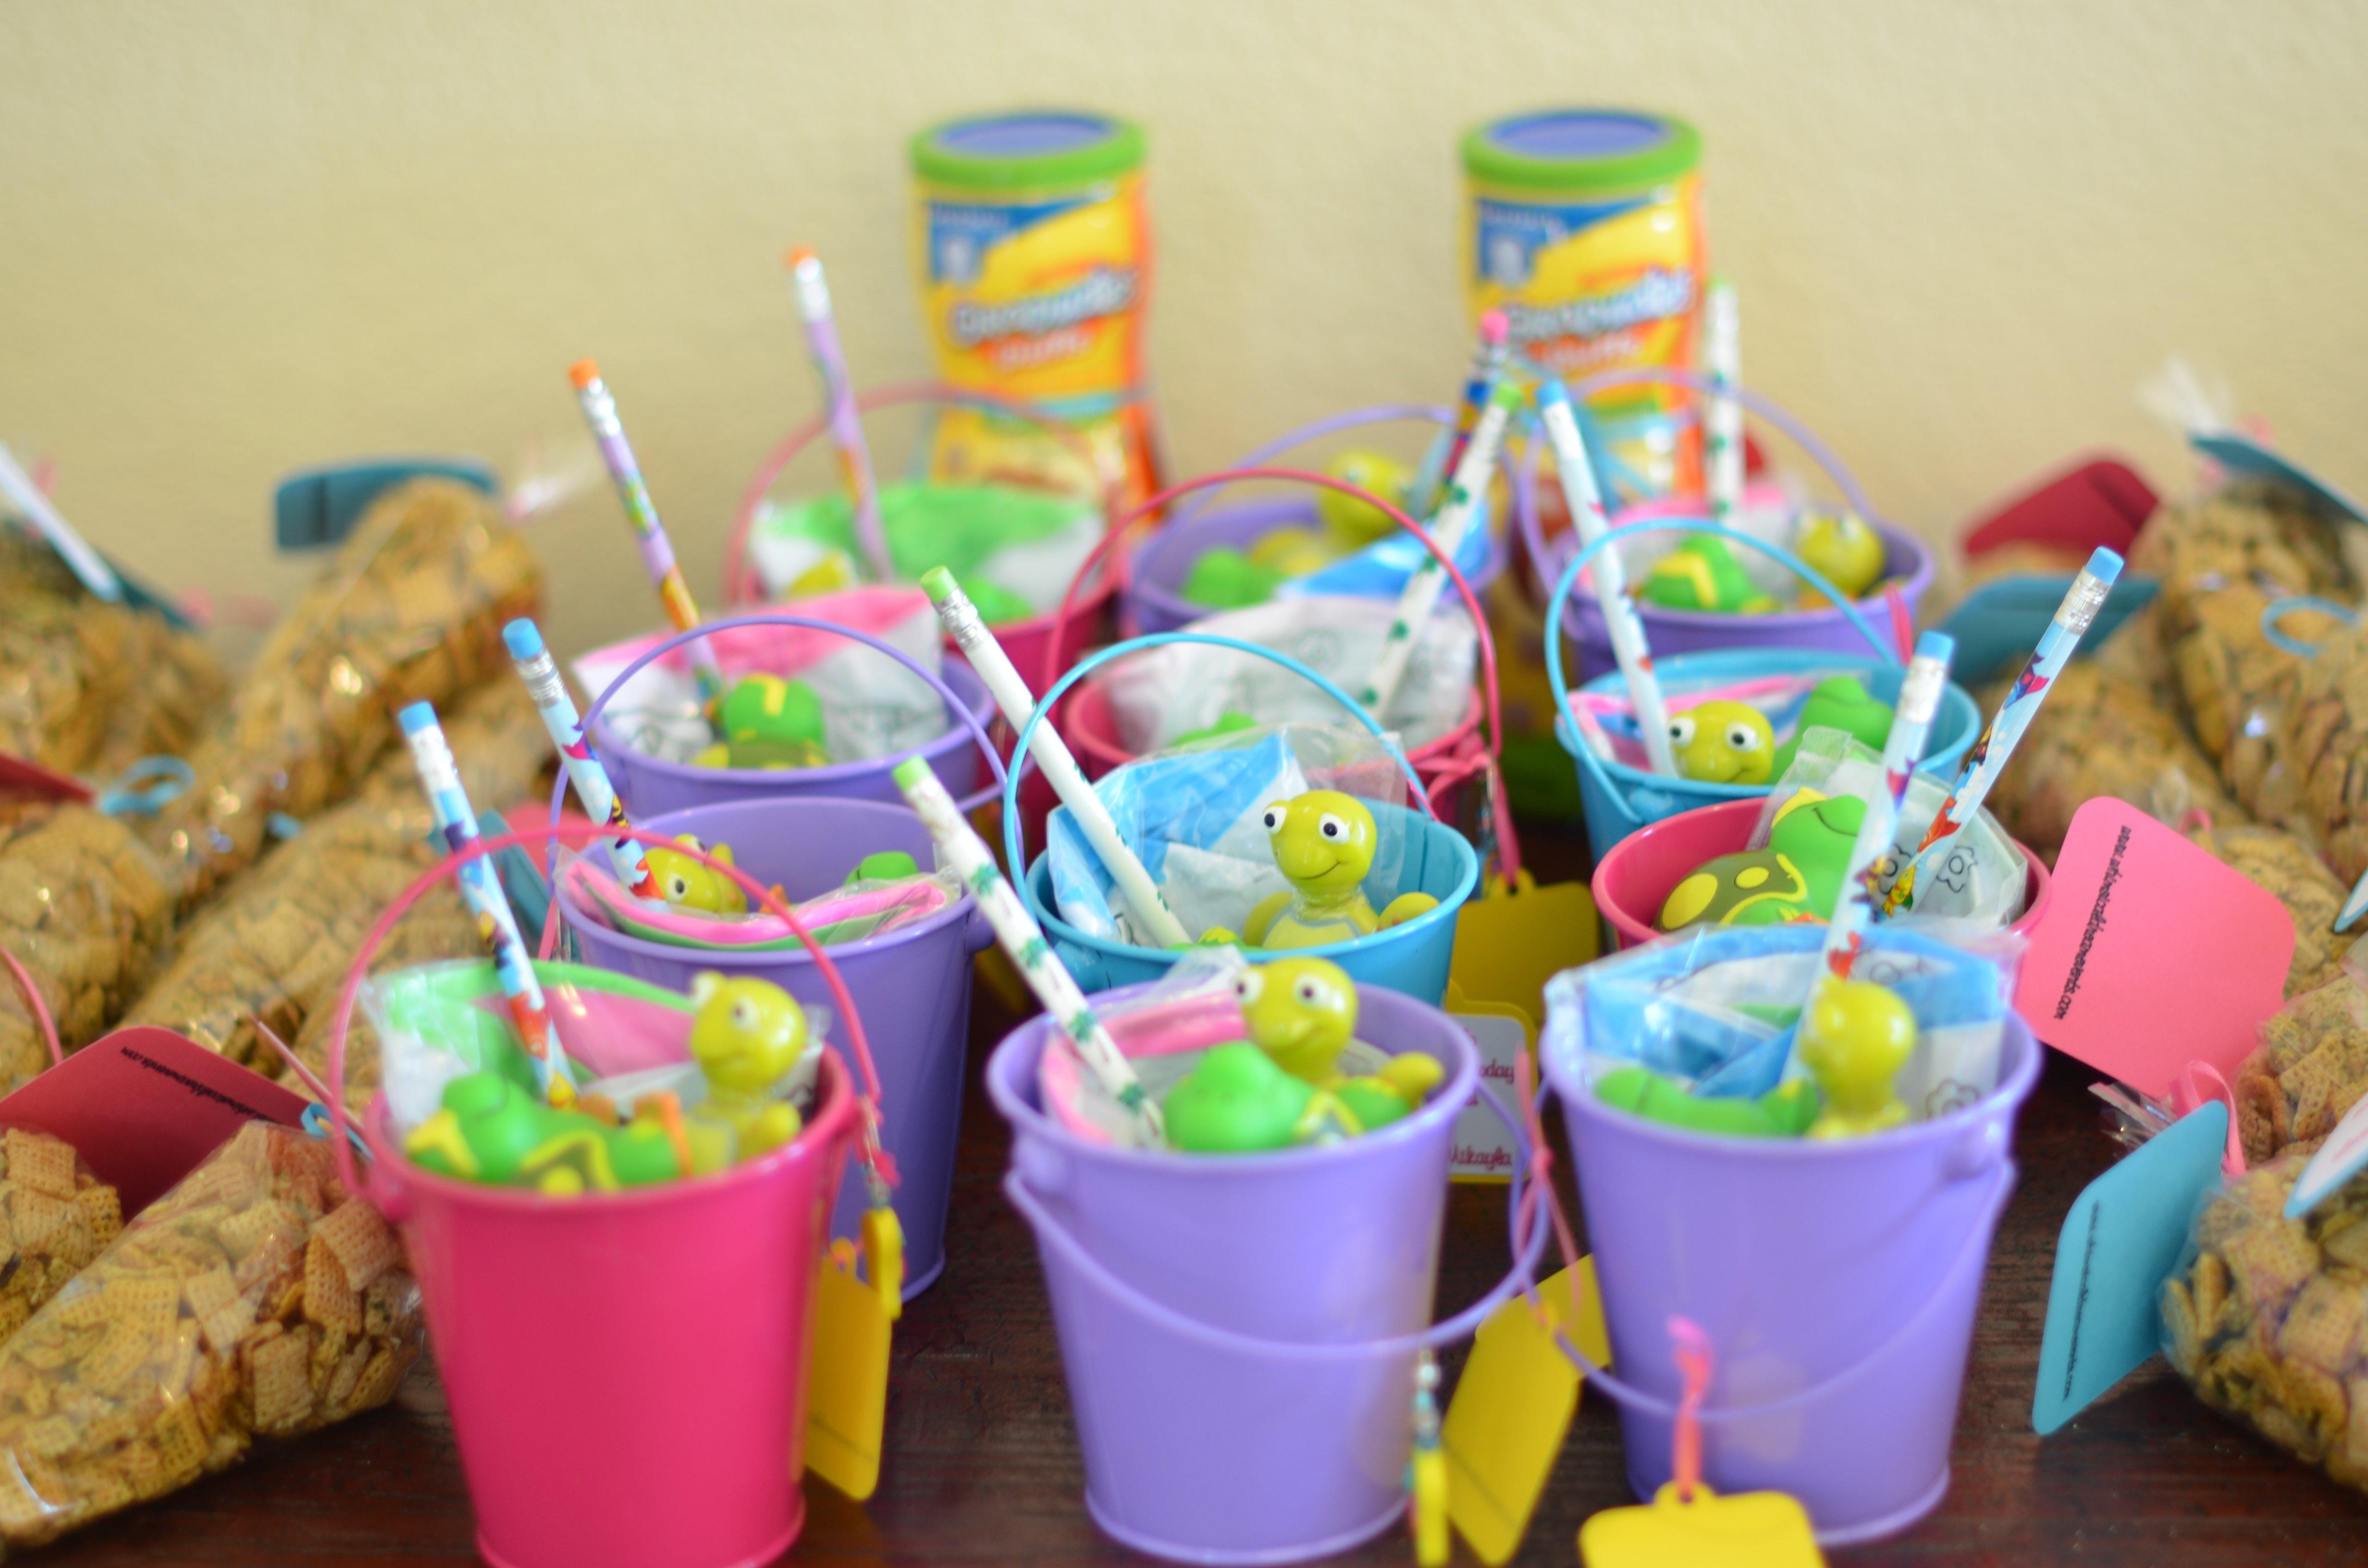 10 Pretty Ideas For Birthday Party Favors party favor ideas asylumxperiment 2021